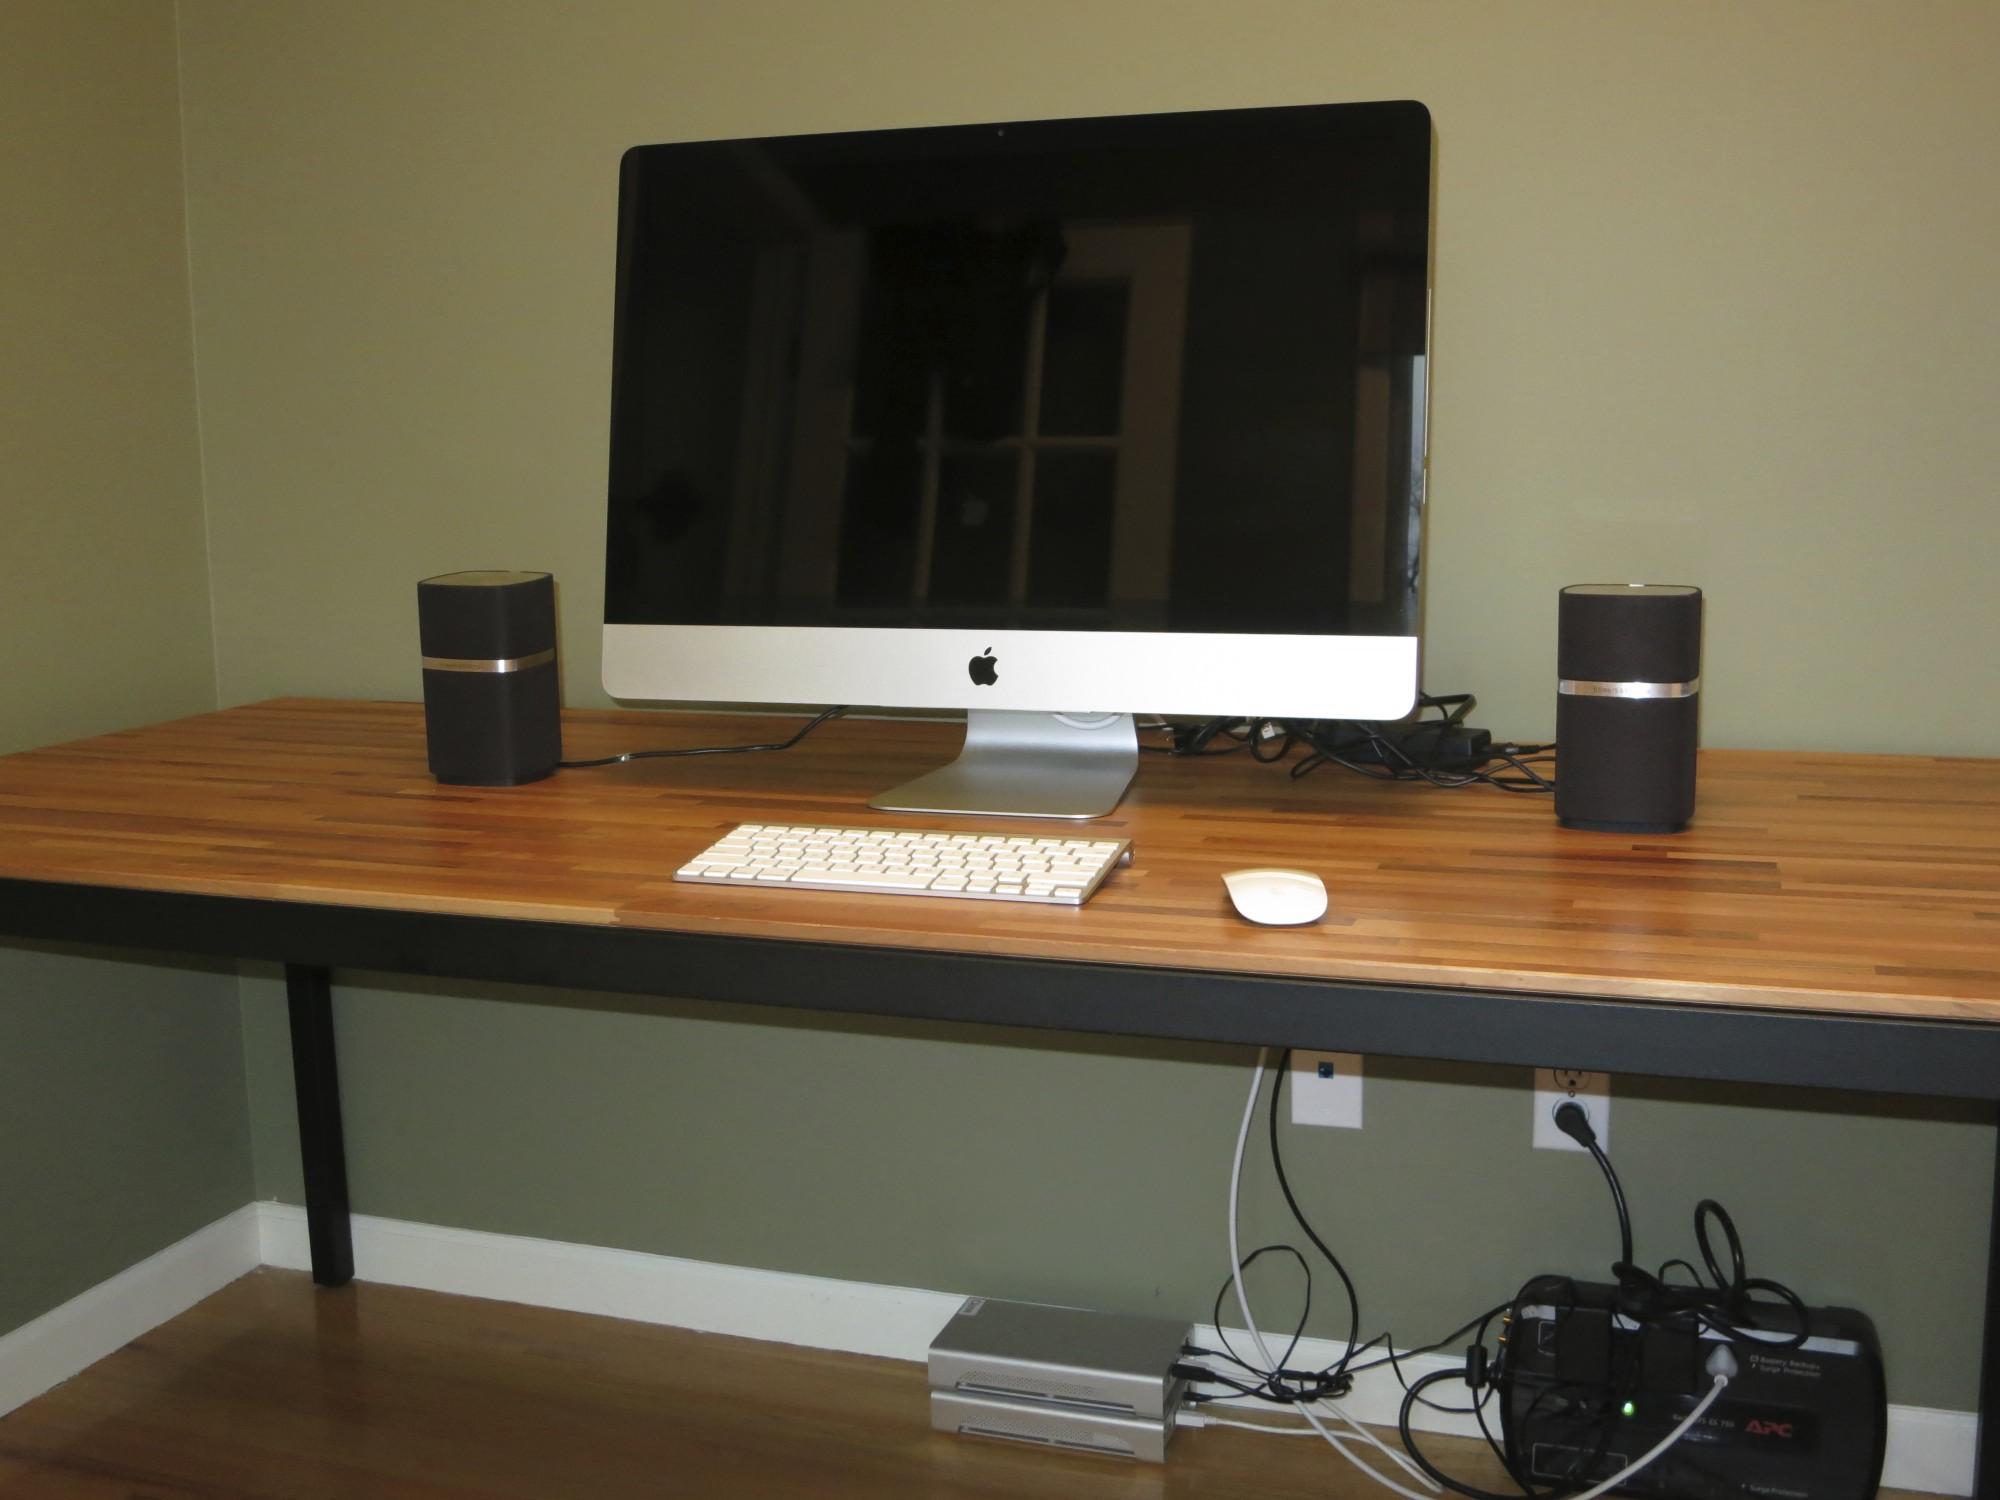 Desk for 27 inch imac best home design 2018 - Desk for imac inch ...